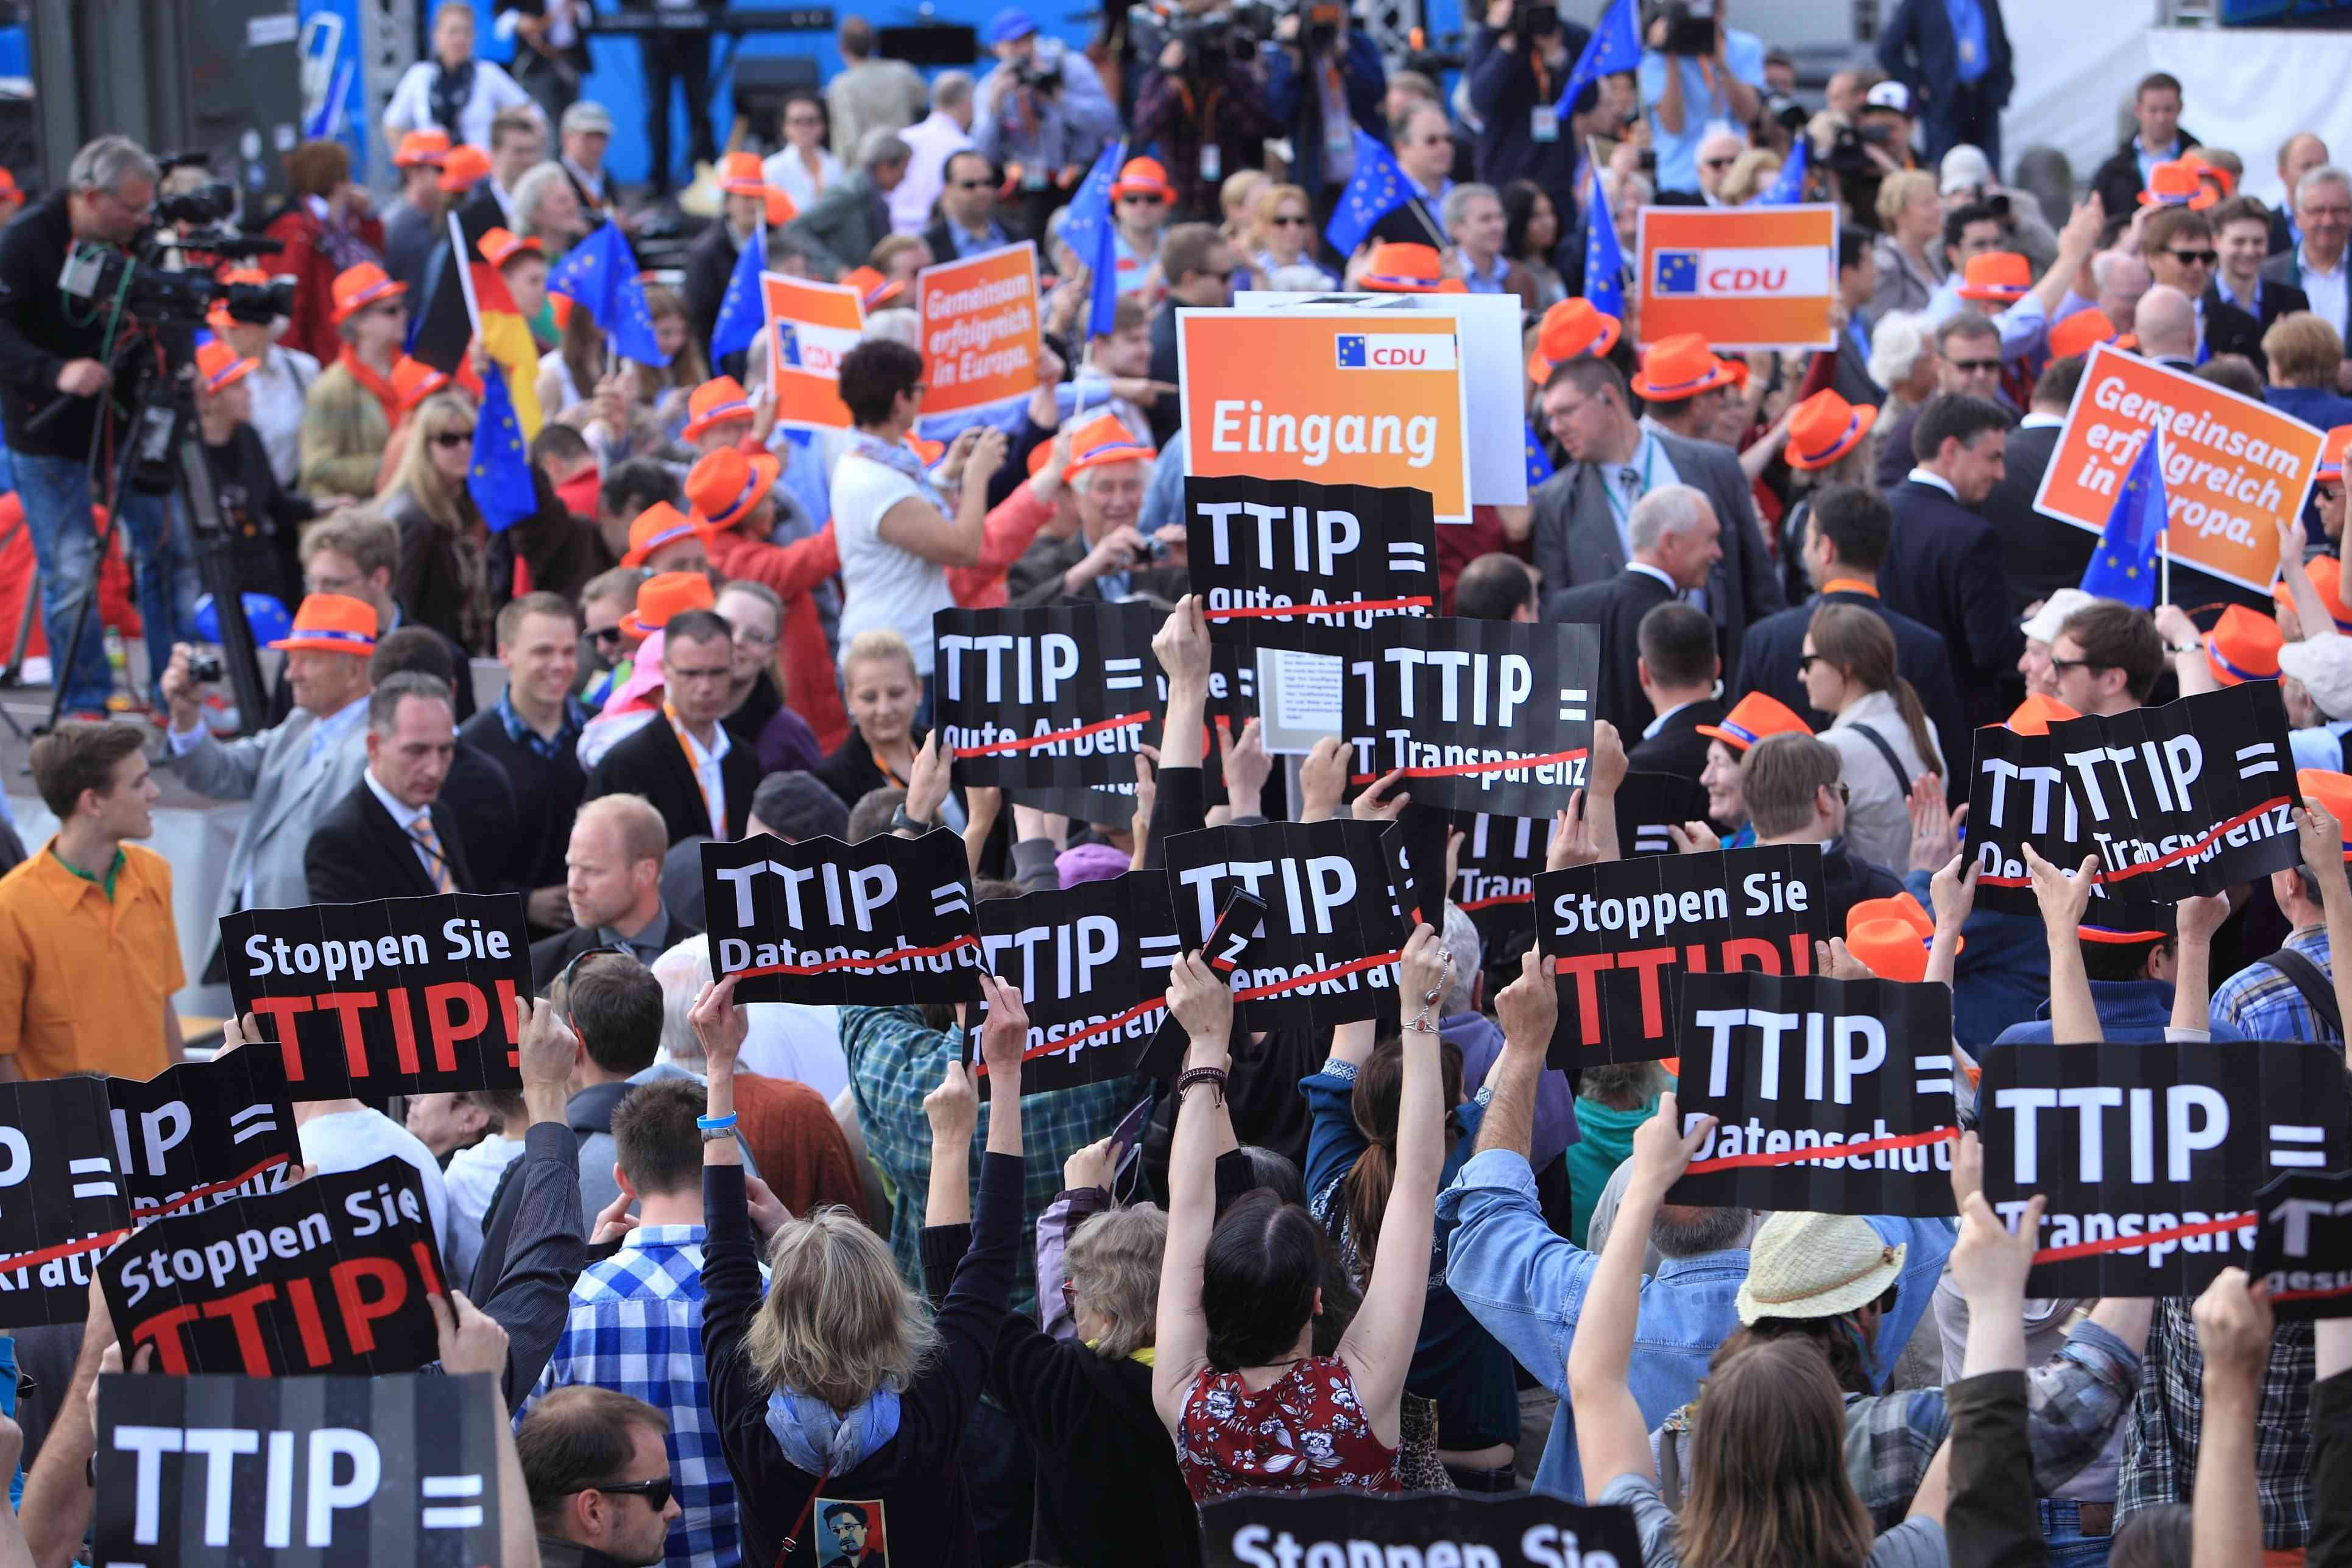 U.S.-EU trade talks threaten climate, spark German protest